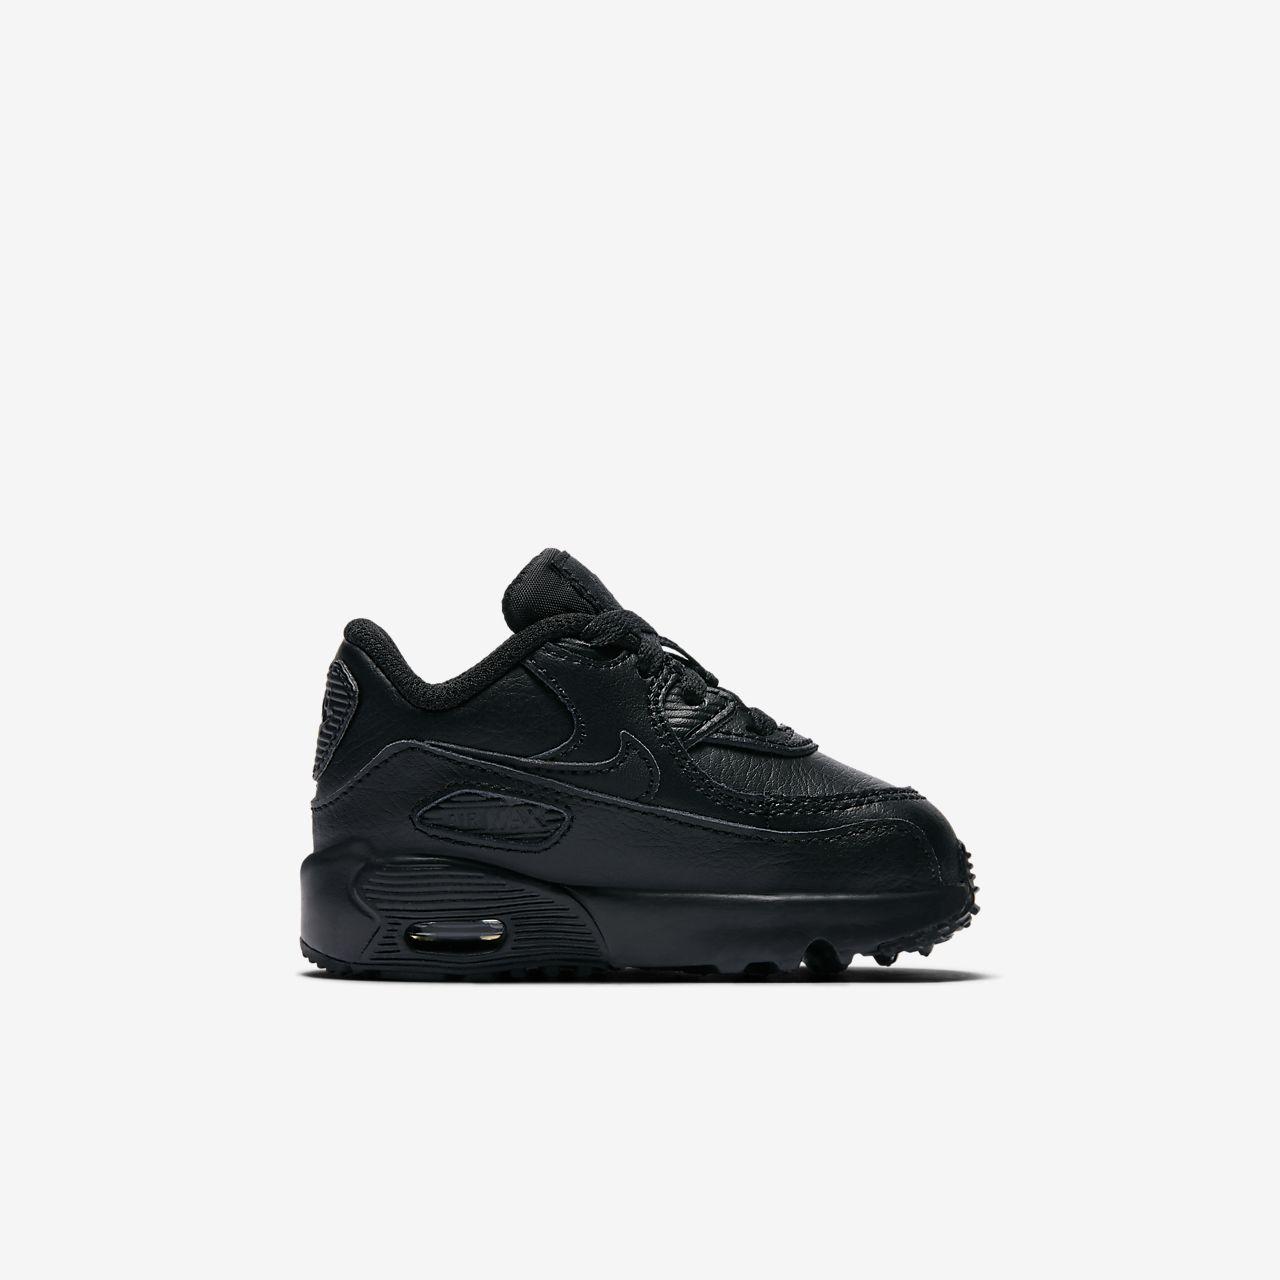 Chaussure Nike Air Leather Max 90 Leather Air pour Bébé/Petit LU efce1f